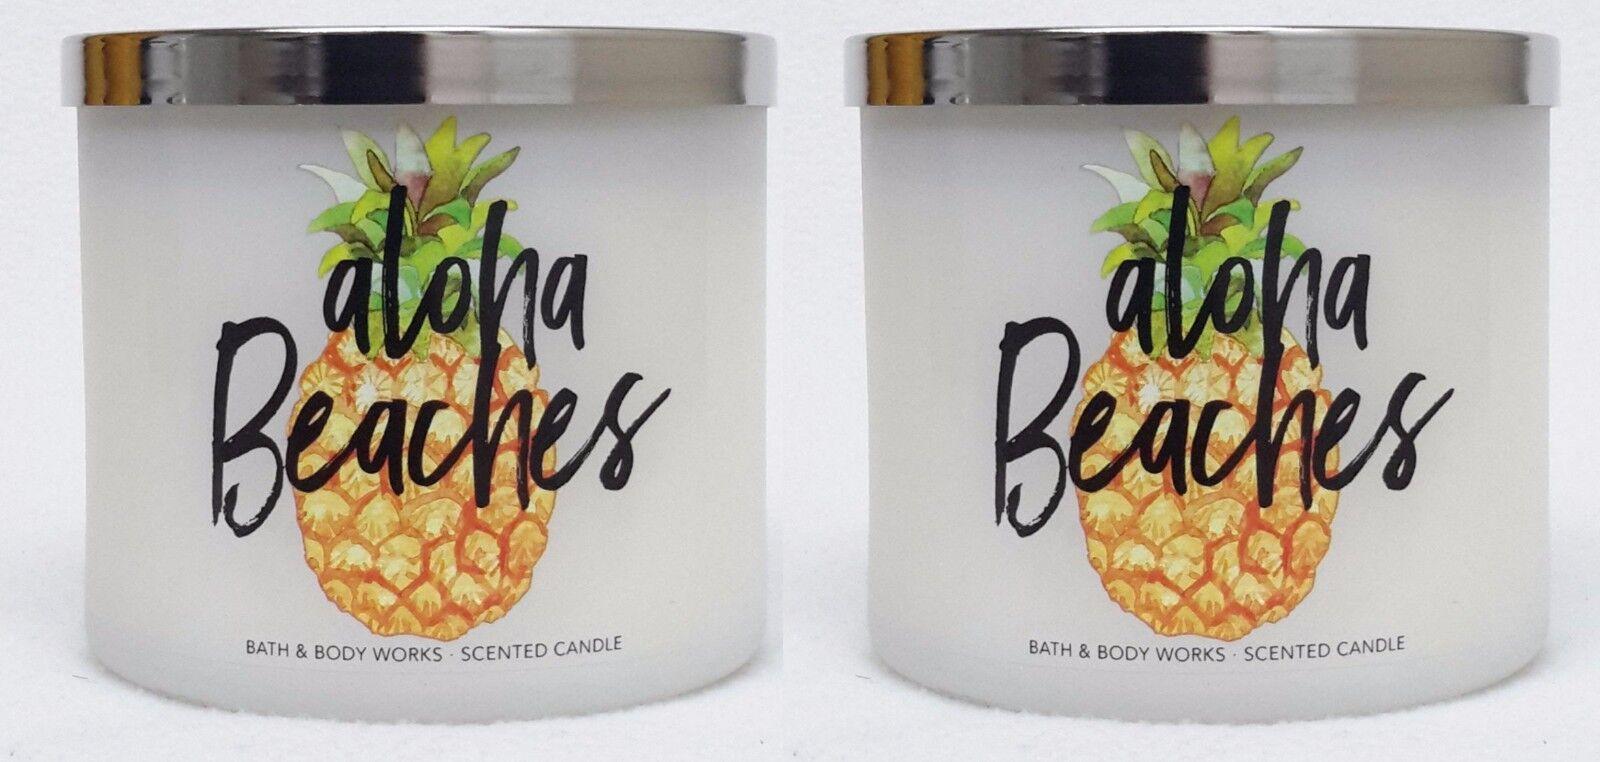 2 Bath & Body Works Aloha Beaches 3-Wick Candle 14.5